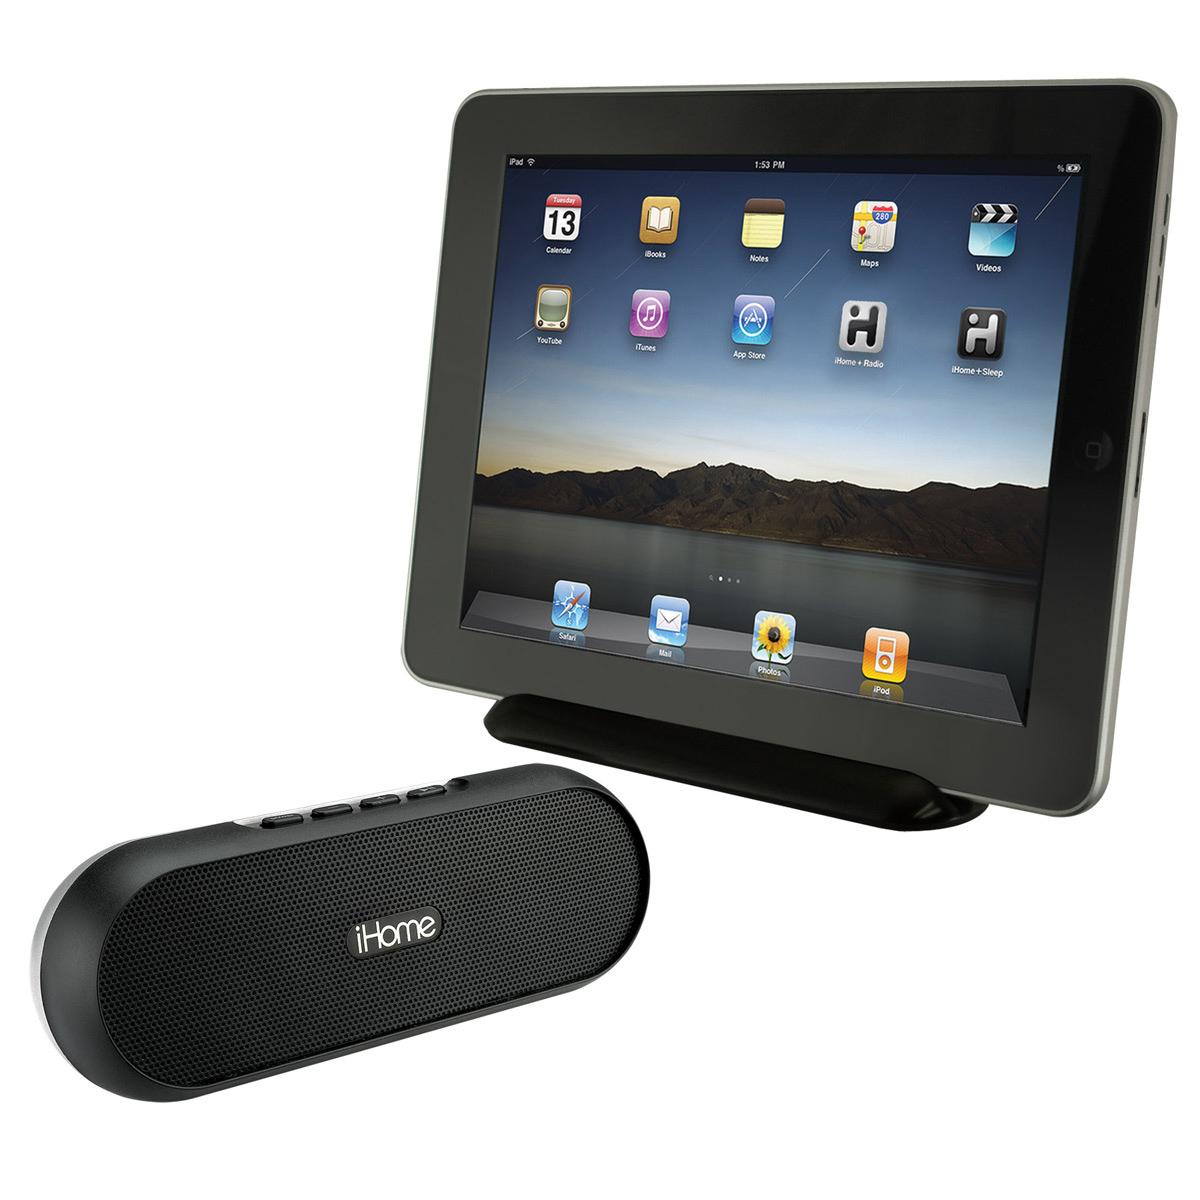 Ihome idm12 iho idm12be achat vente enceinte pc sur - Enceinte iphone ipad ...